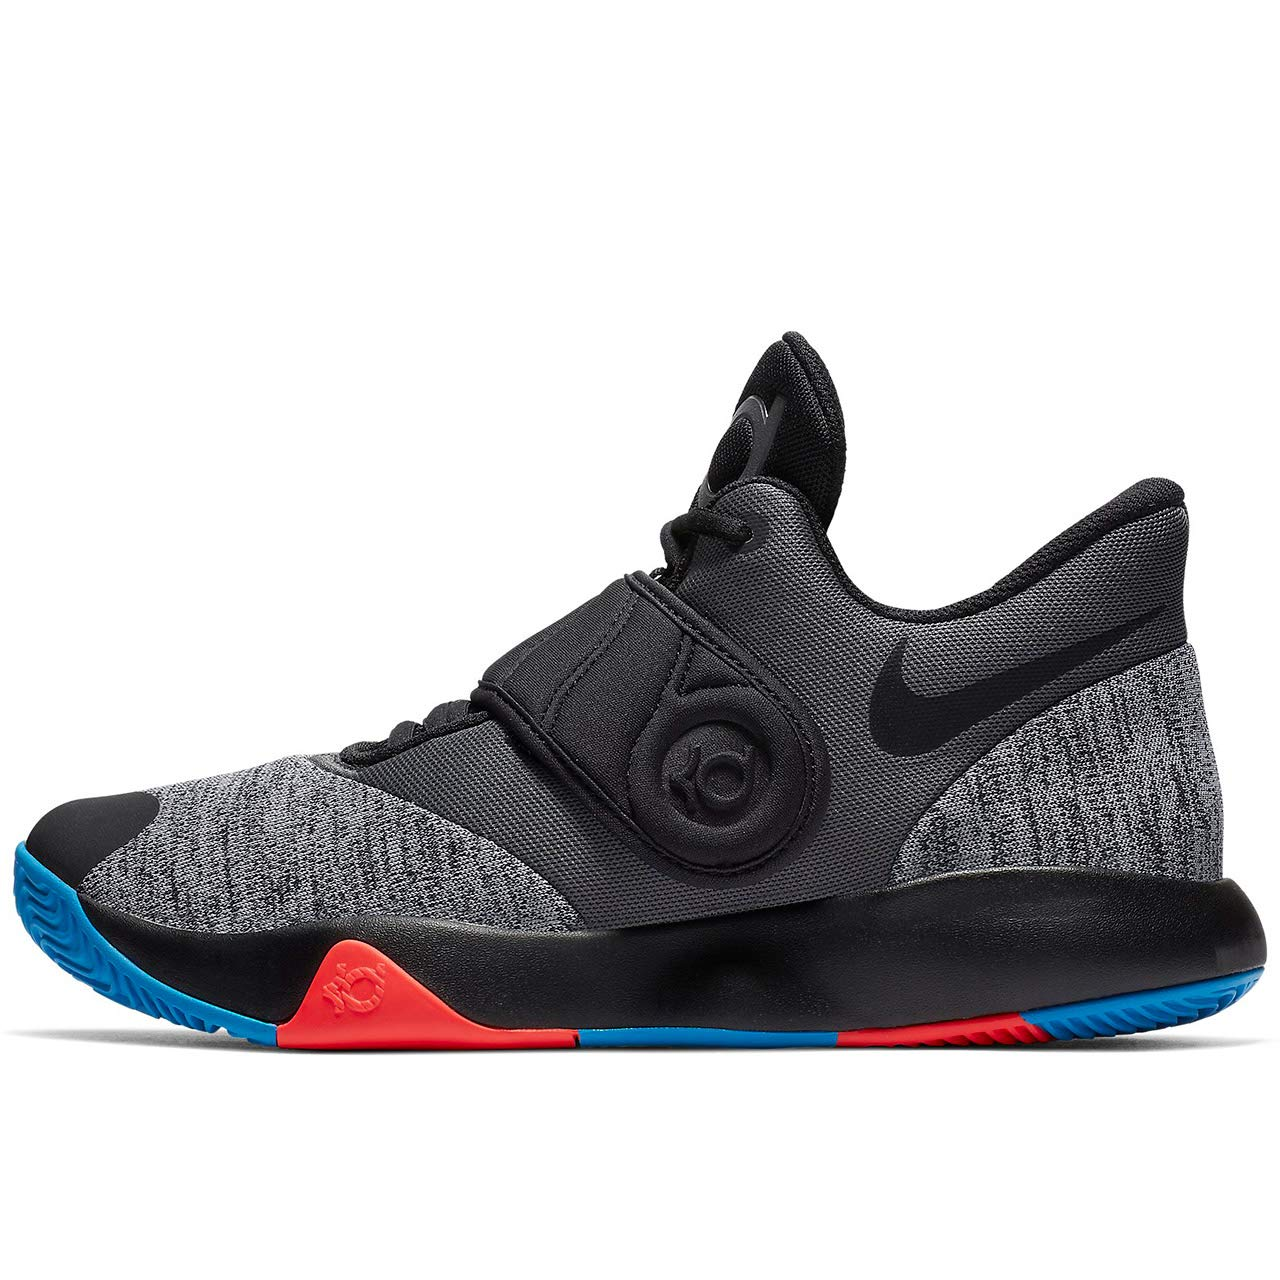 14b754fc39b Amazon.com  Nike Men s KD Trey 5 VI Basketball Shoe Black Chrome Photo  Blue Bright Crimson Size 11 M US  Sports   Outdoors